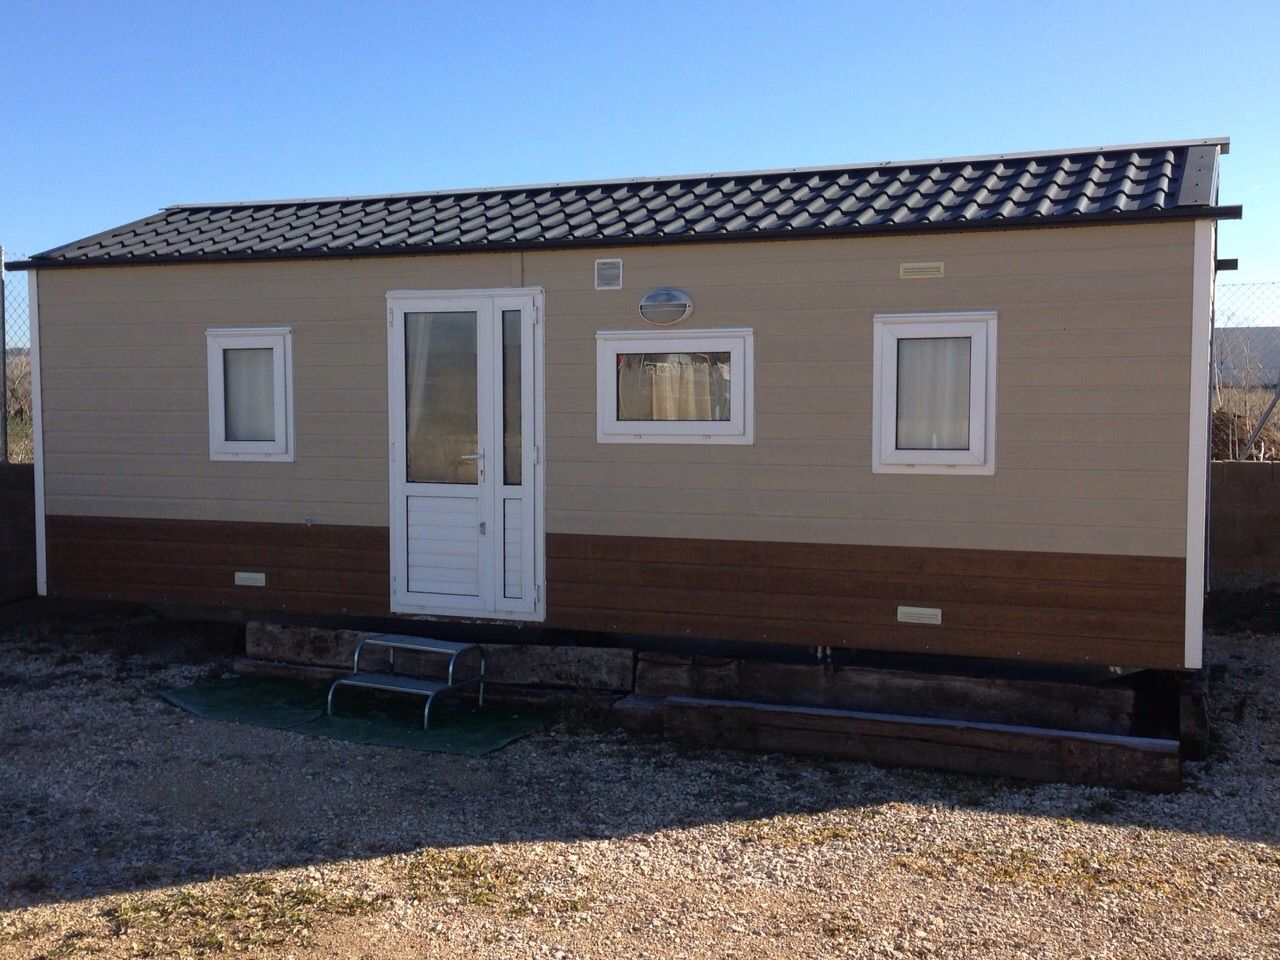 Casas prefabricadas hipotecables para fincas urbanas - Catalogo casas prefabricadas ...